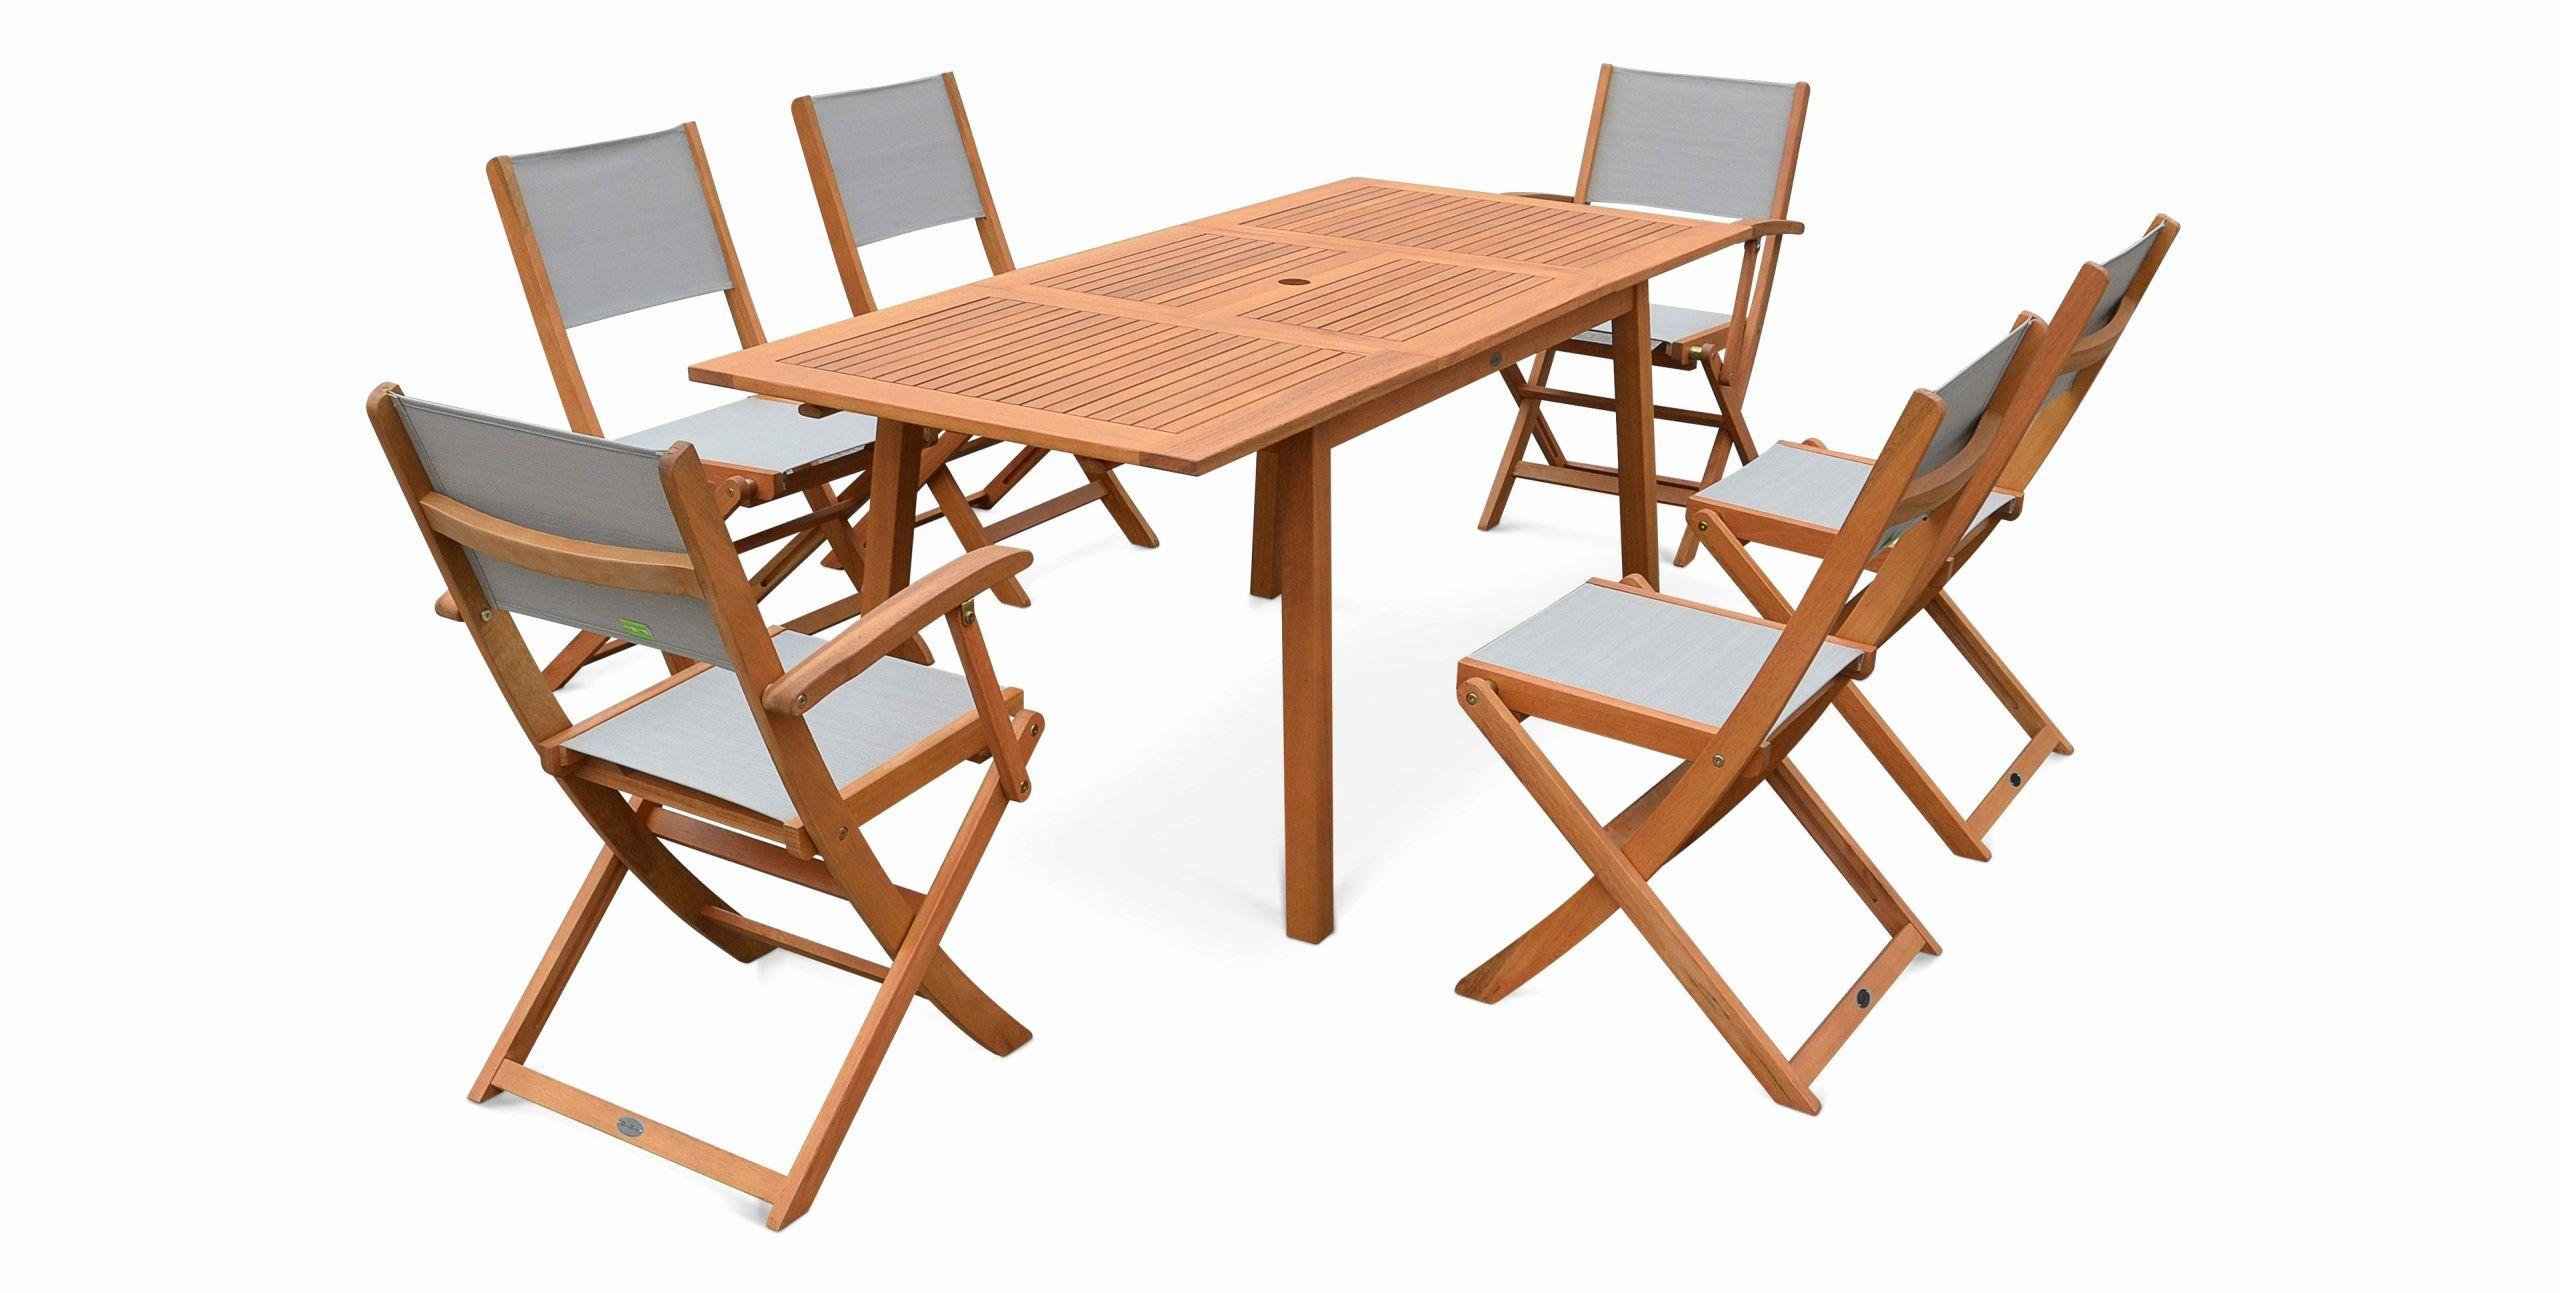 Table De Jardin Plastique Blanc Luxe Salon De Jardin Leclerc ... avec Mobilier De Jardin Leclerc